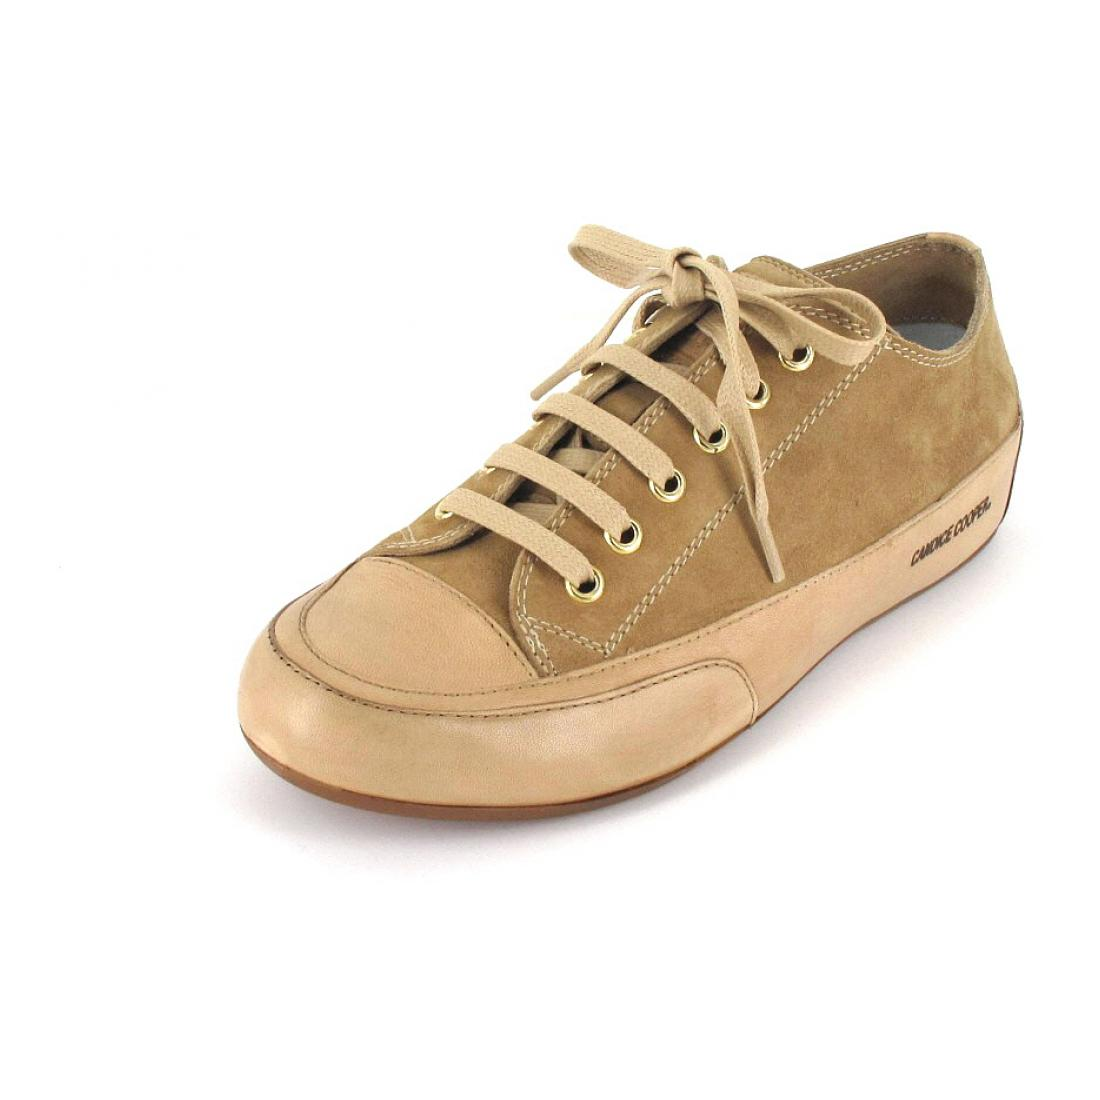 Candice Cooper Sneaker Rock camoscio